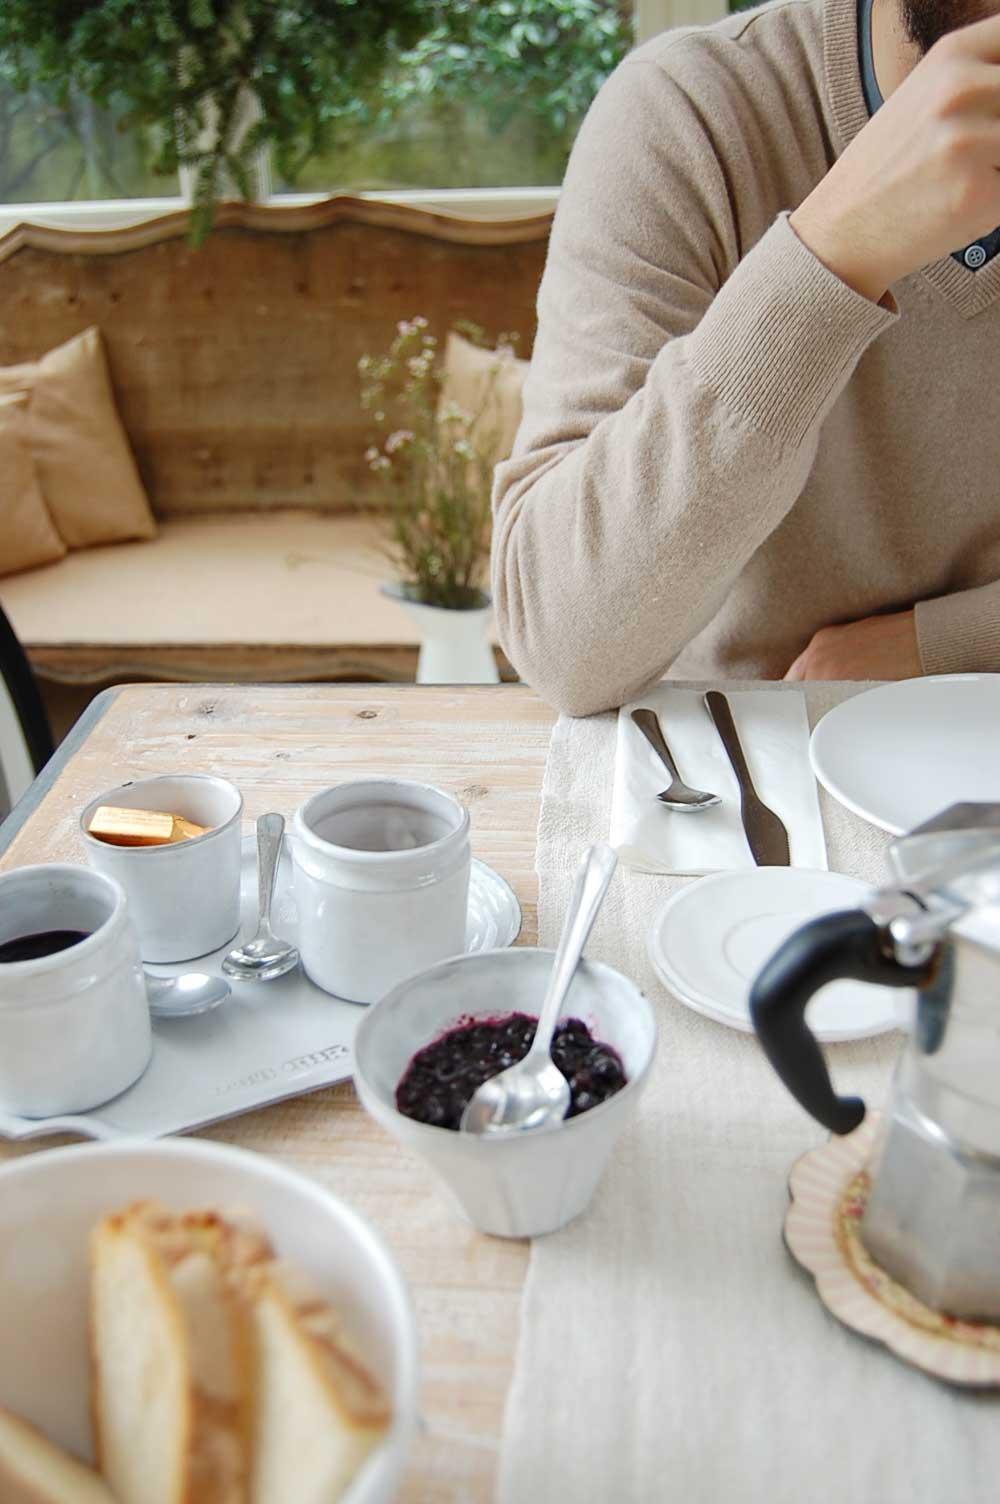 valdirose-colazione-2-valdirose